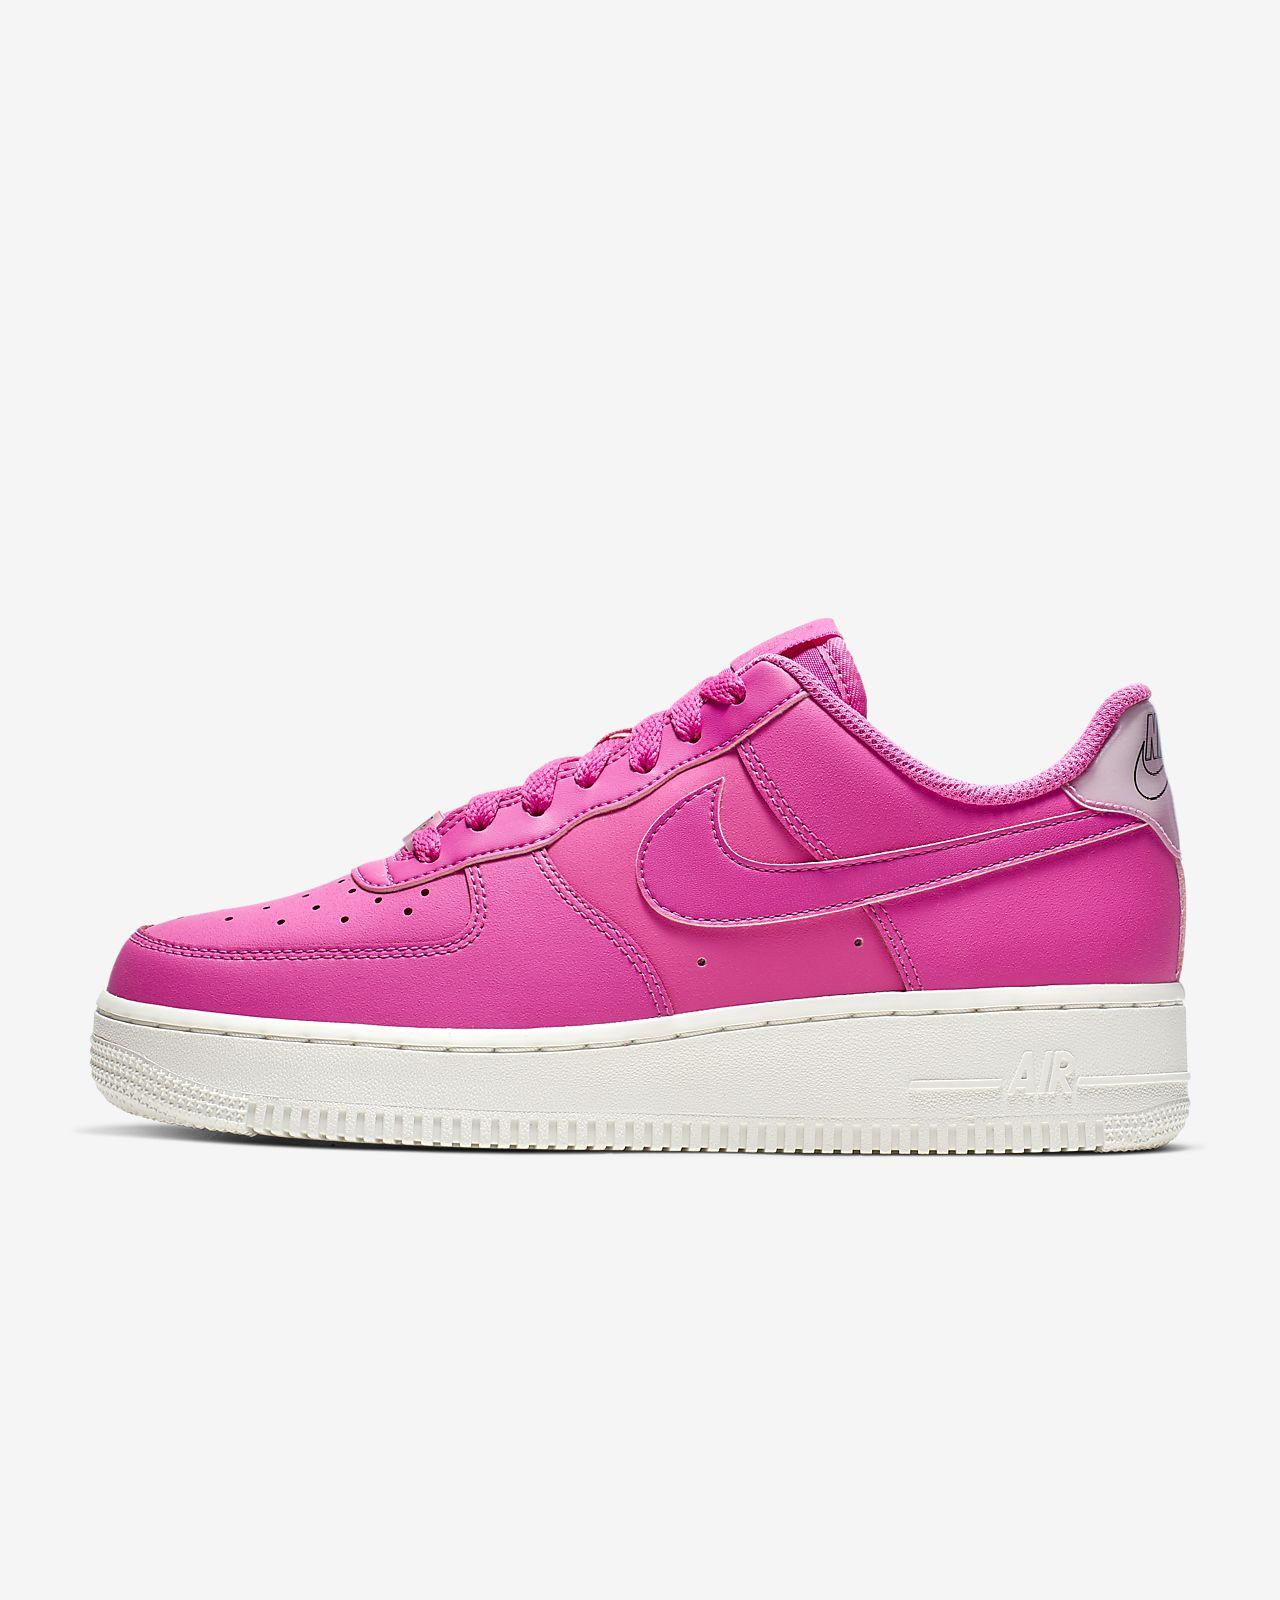 Sko Nike Air Force 1 '07 Essential för kvinnor